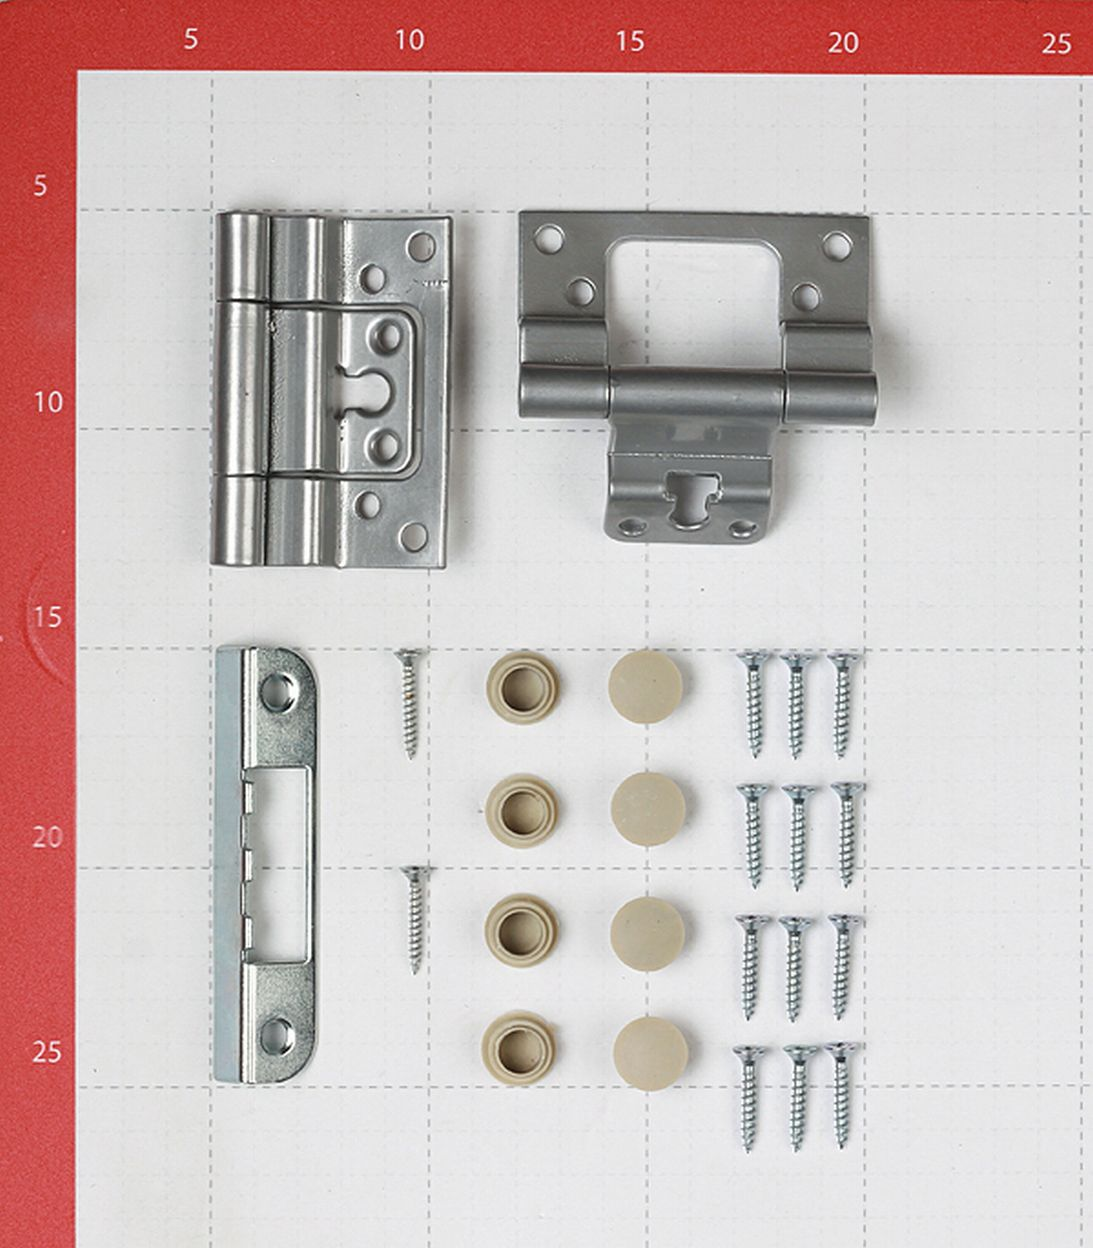 Коробка дверная VellDoris TREND, SMART экошпон капучино 38х80х2042 мм (959х2042 мм) (2,5 шт.)